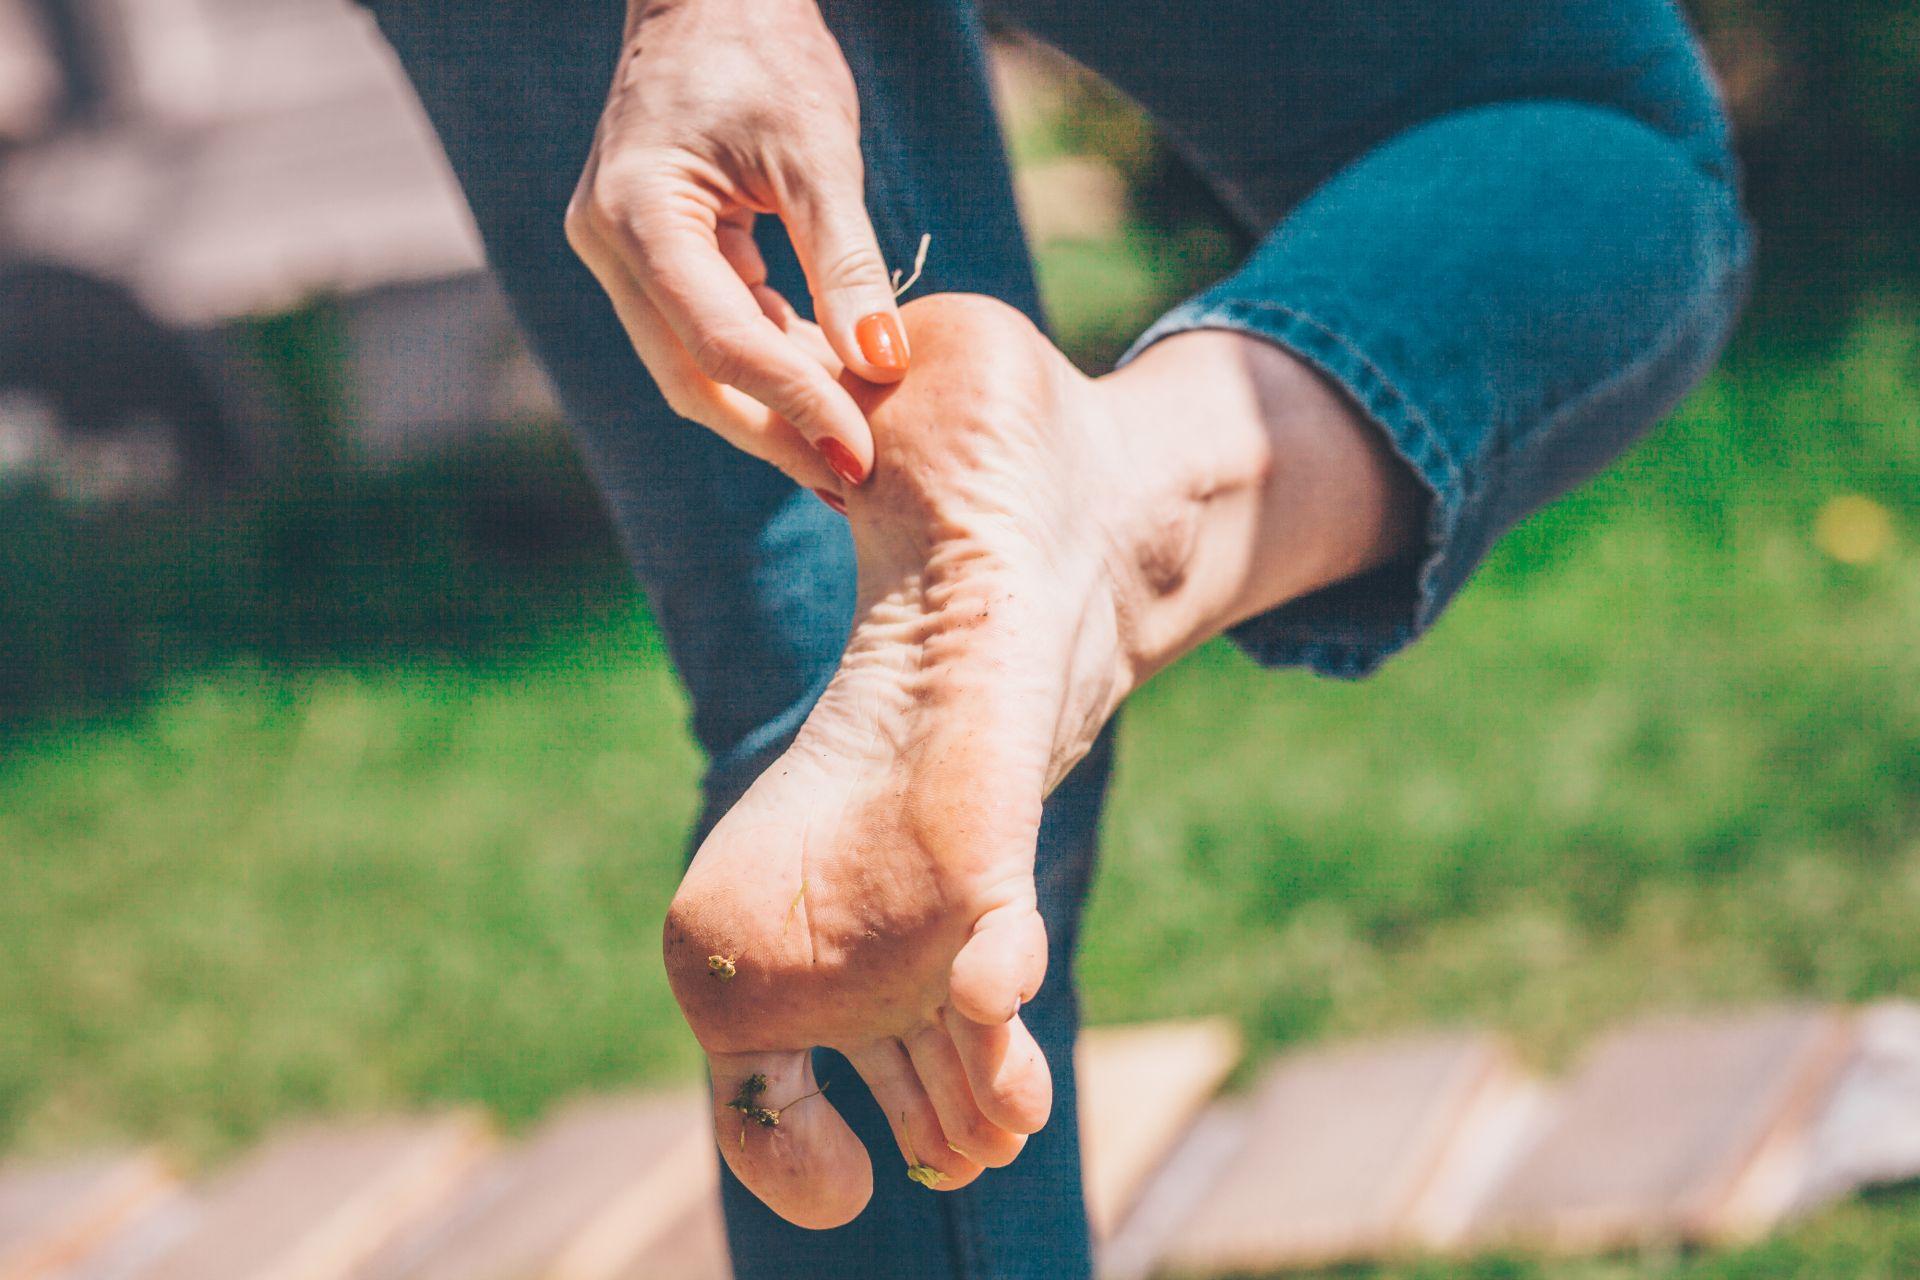 kobieta ogląda swoje stopy